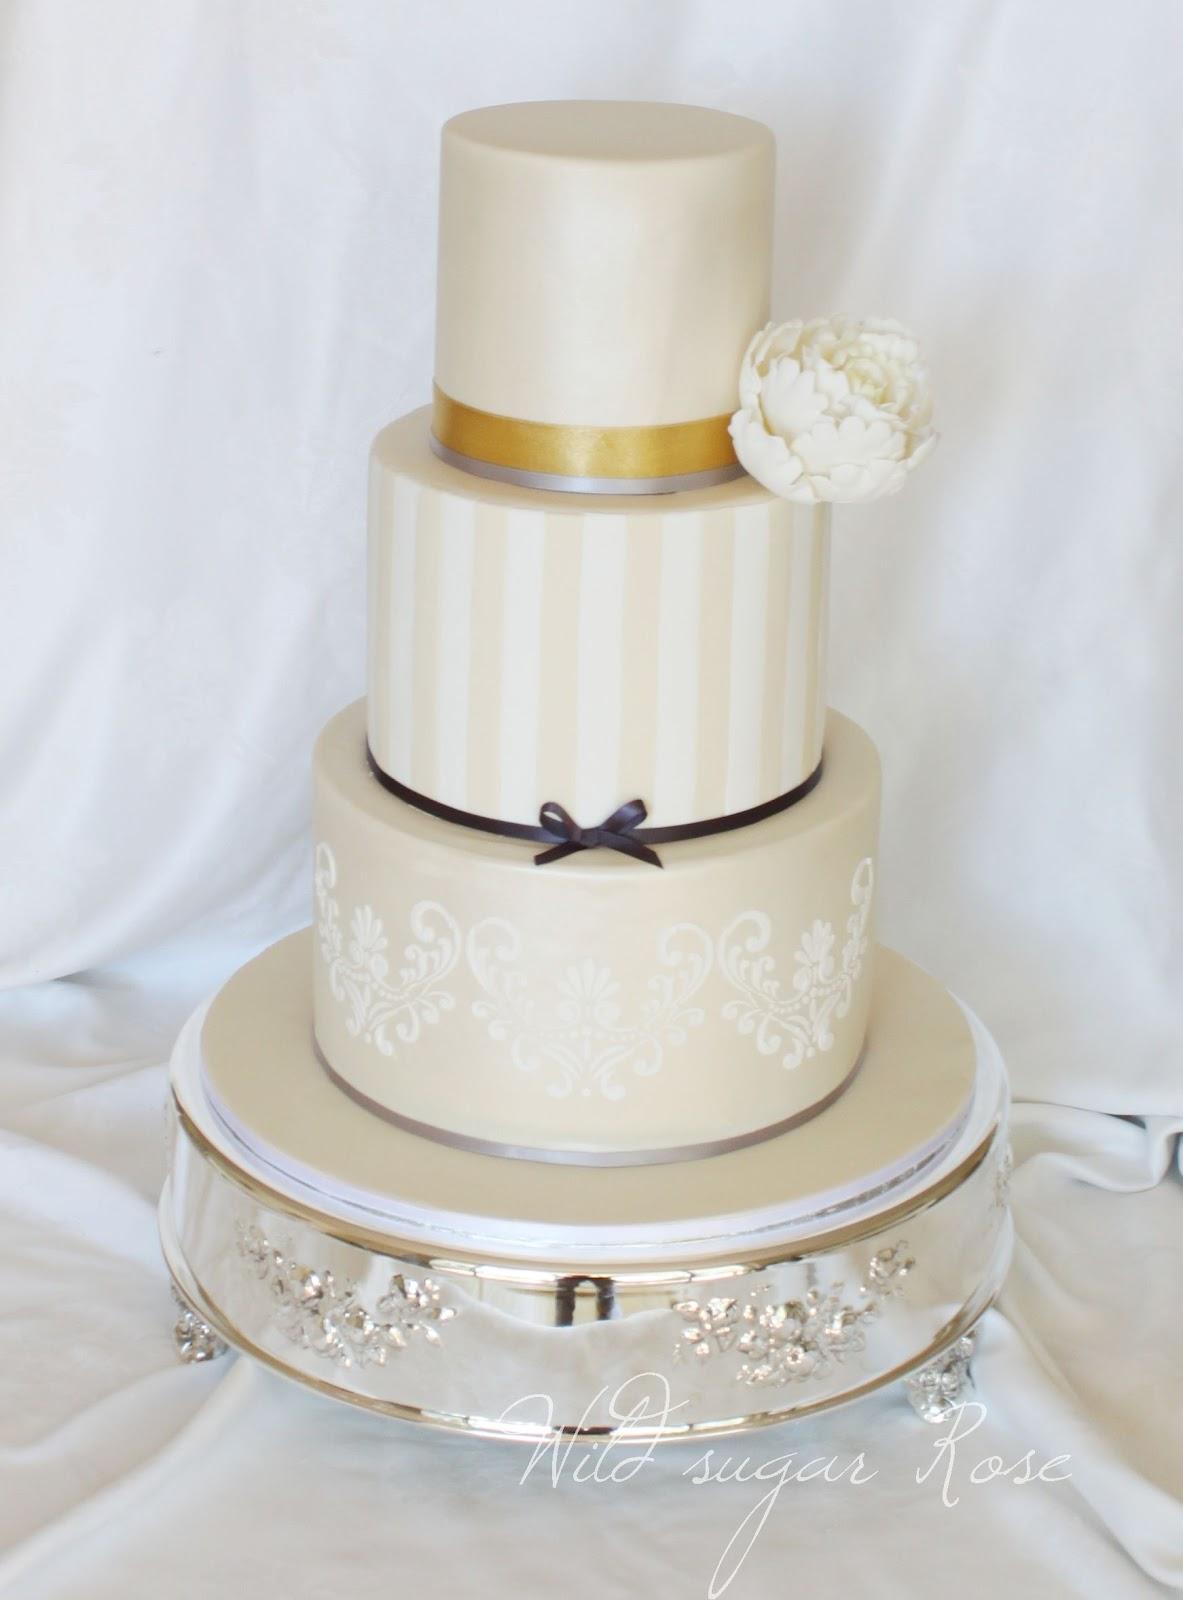 Wild sugar Rose - wedding cakes, cupcakes and cake decorating ...